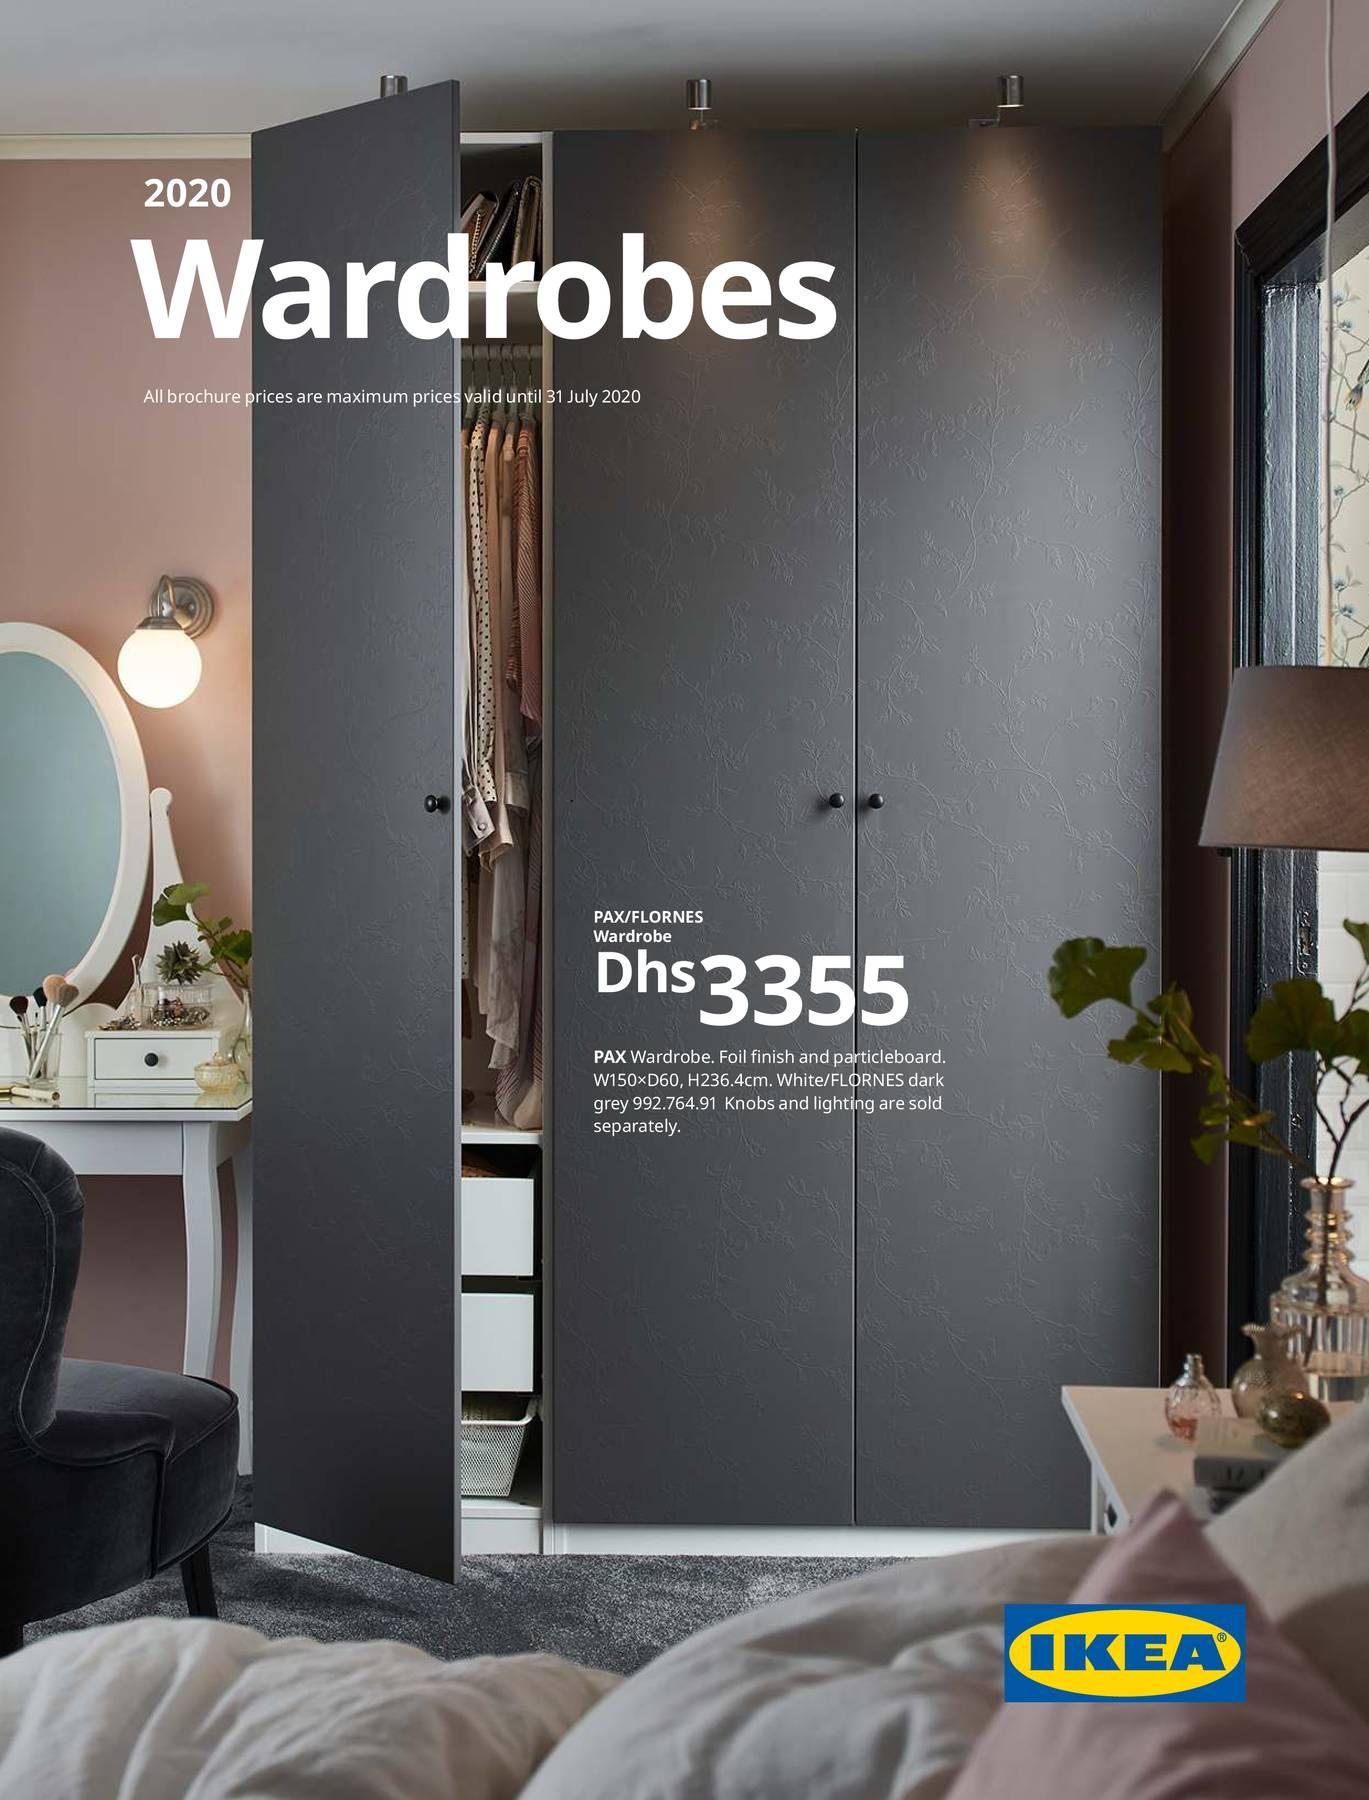 [Image: wardrobe-1.jpg]